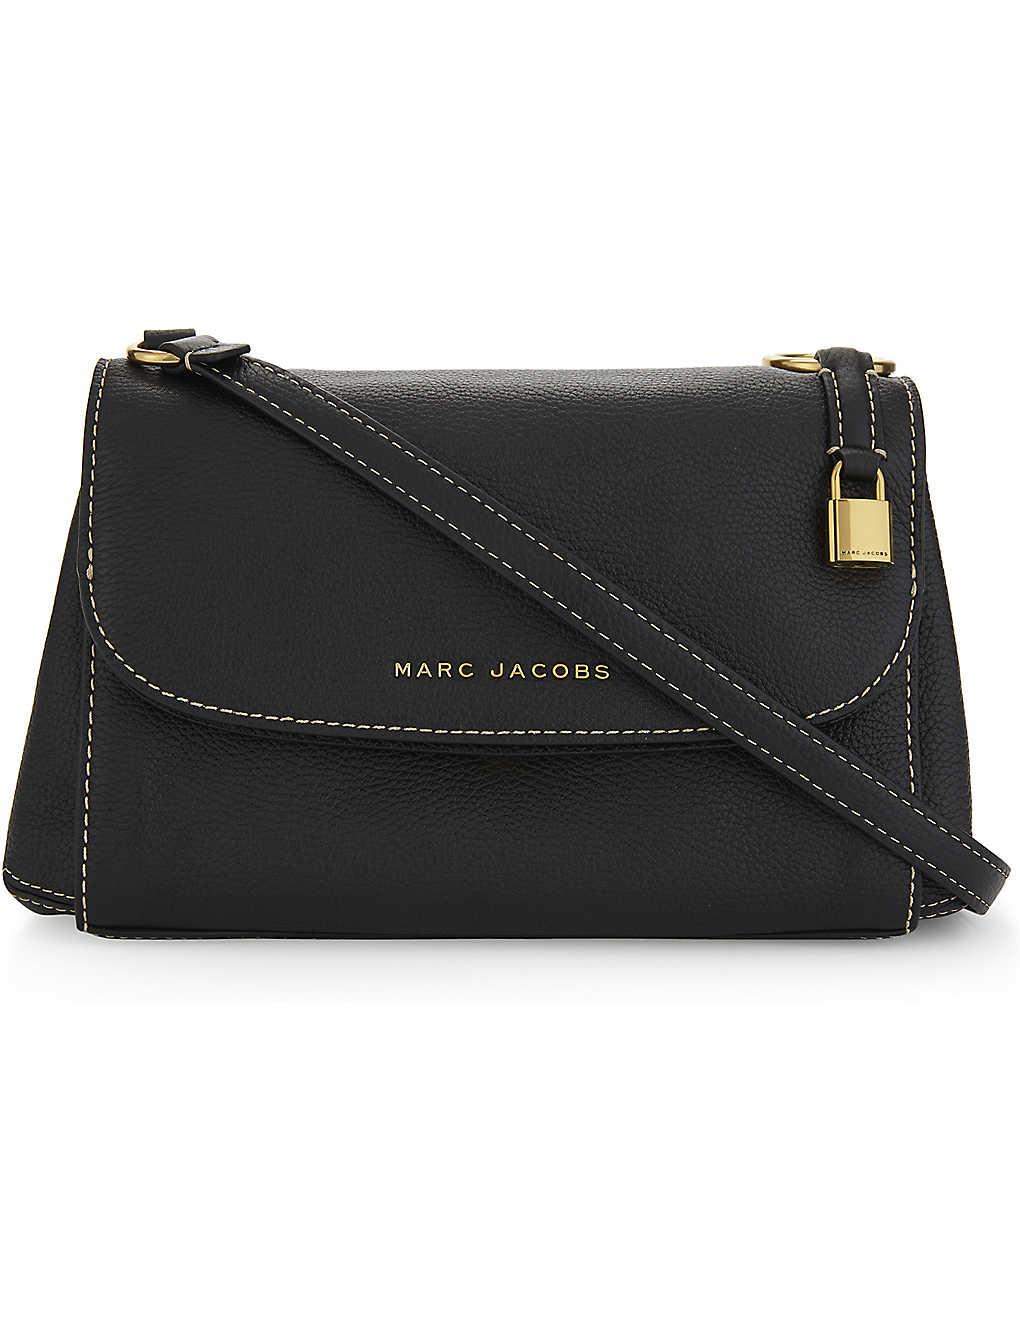 4c8941330e2bf4 MARC JACOBS - Boho Grind leather cross-body bag   Selfridges.com